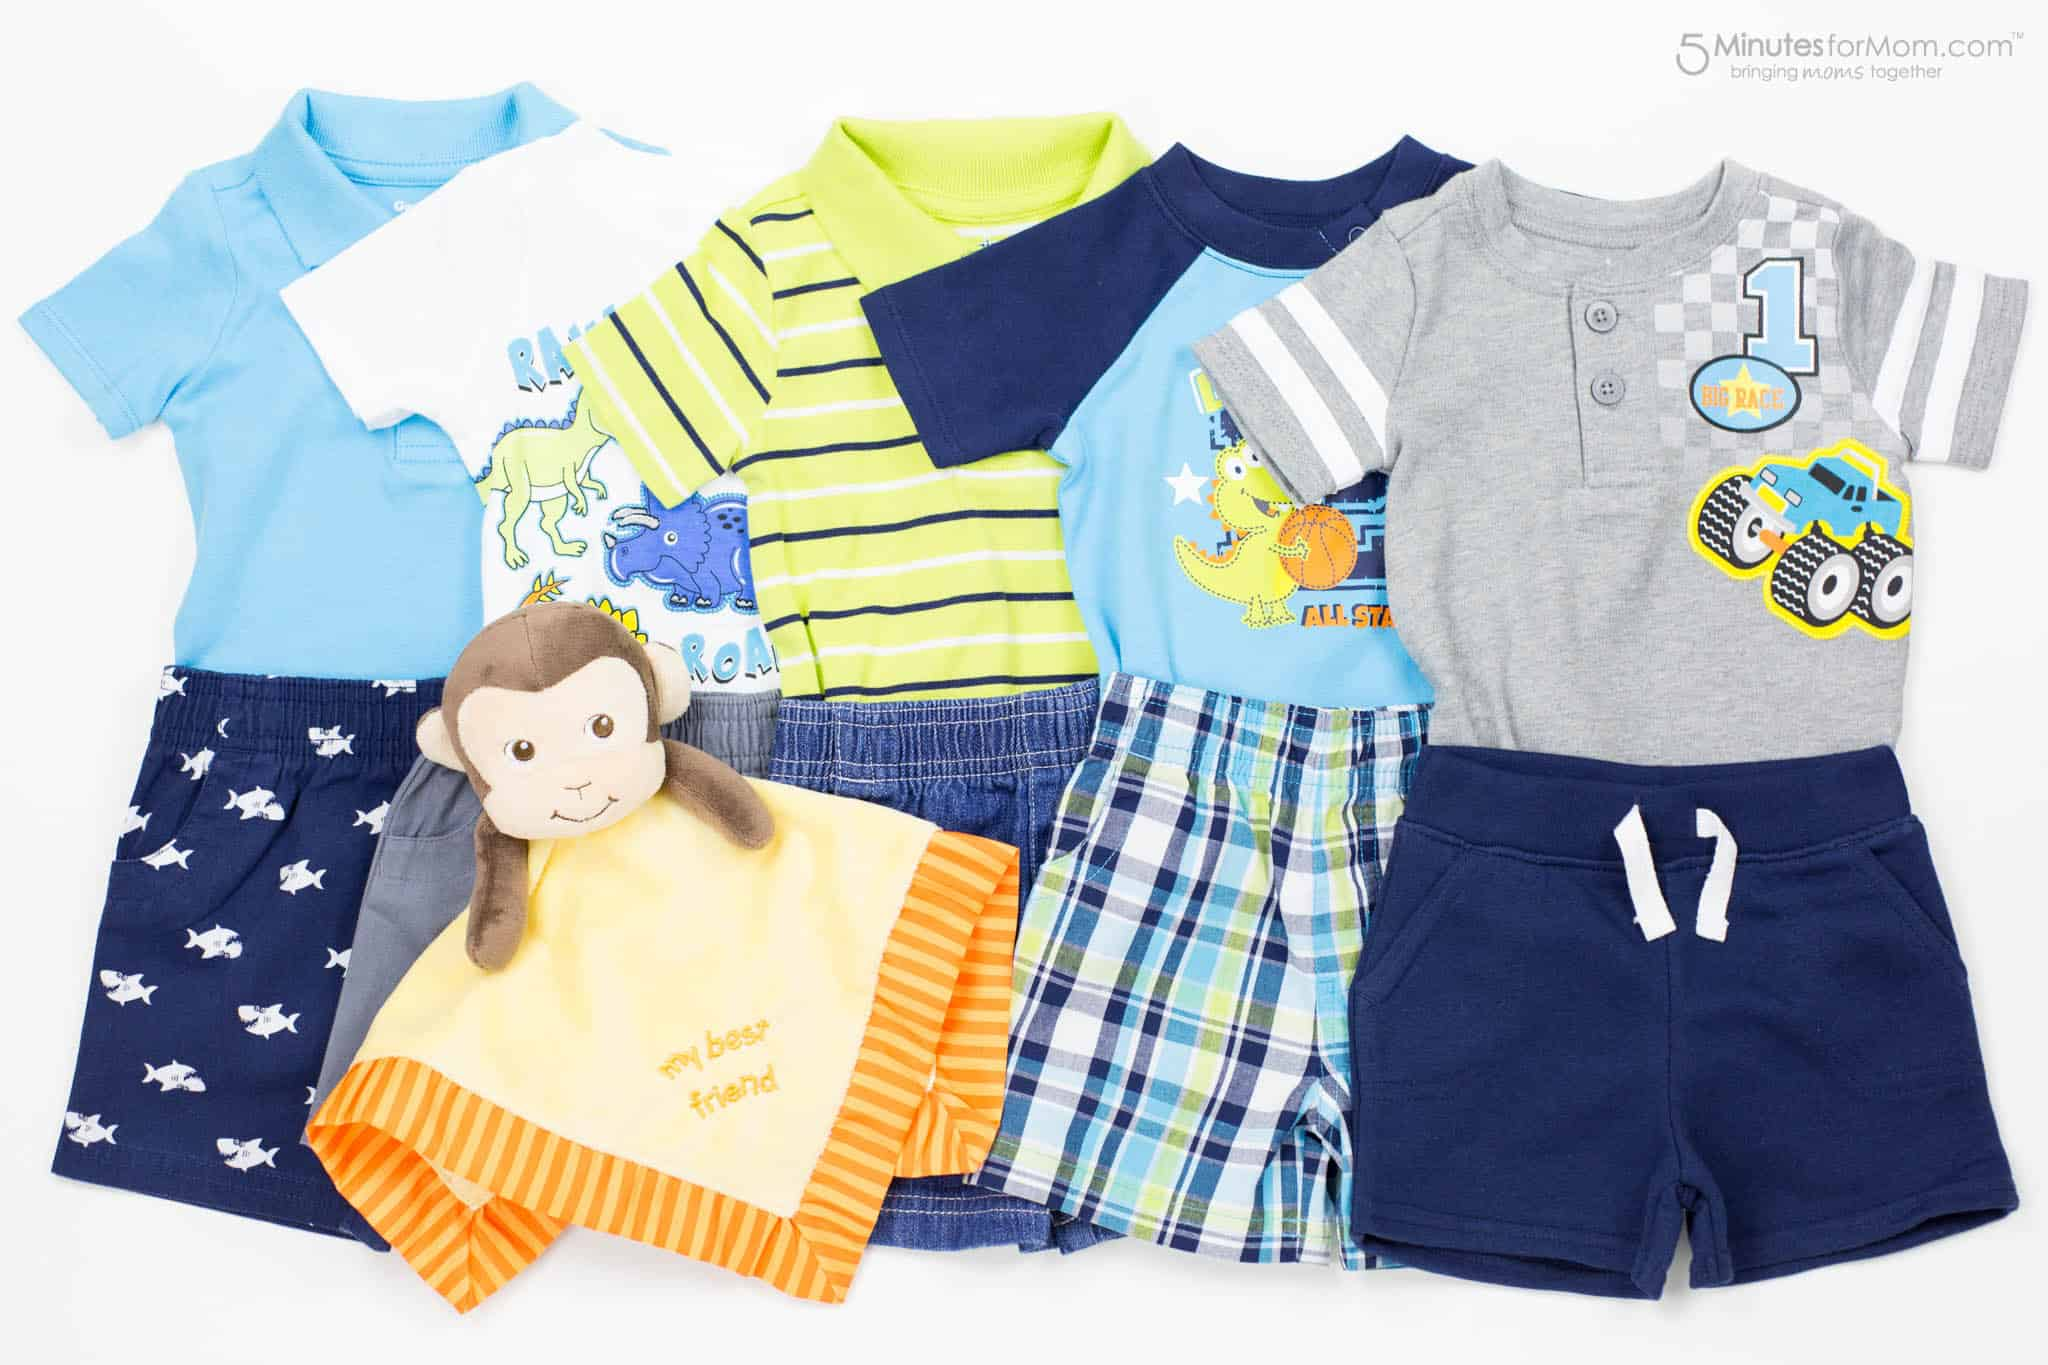 Garanimals Mix and Match Baby Clothes